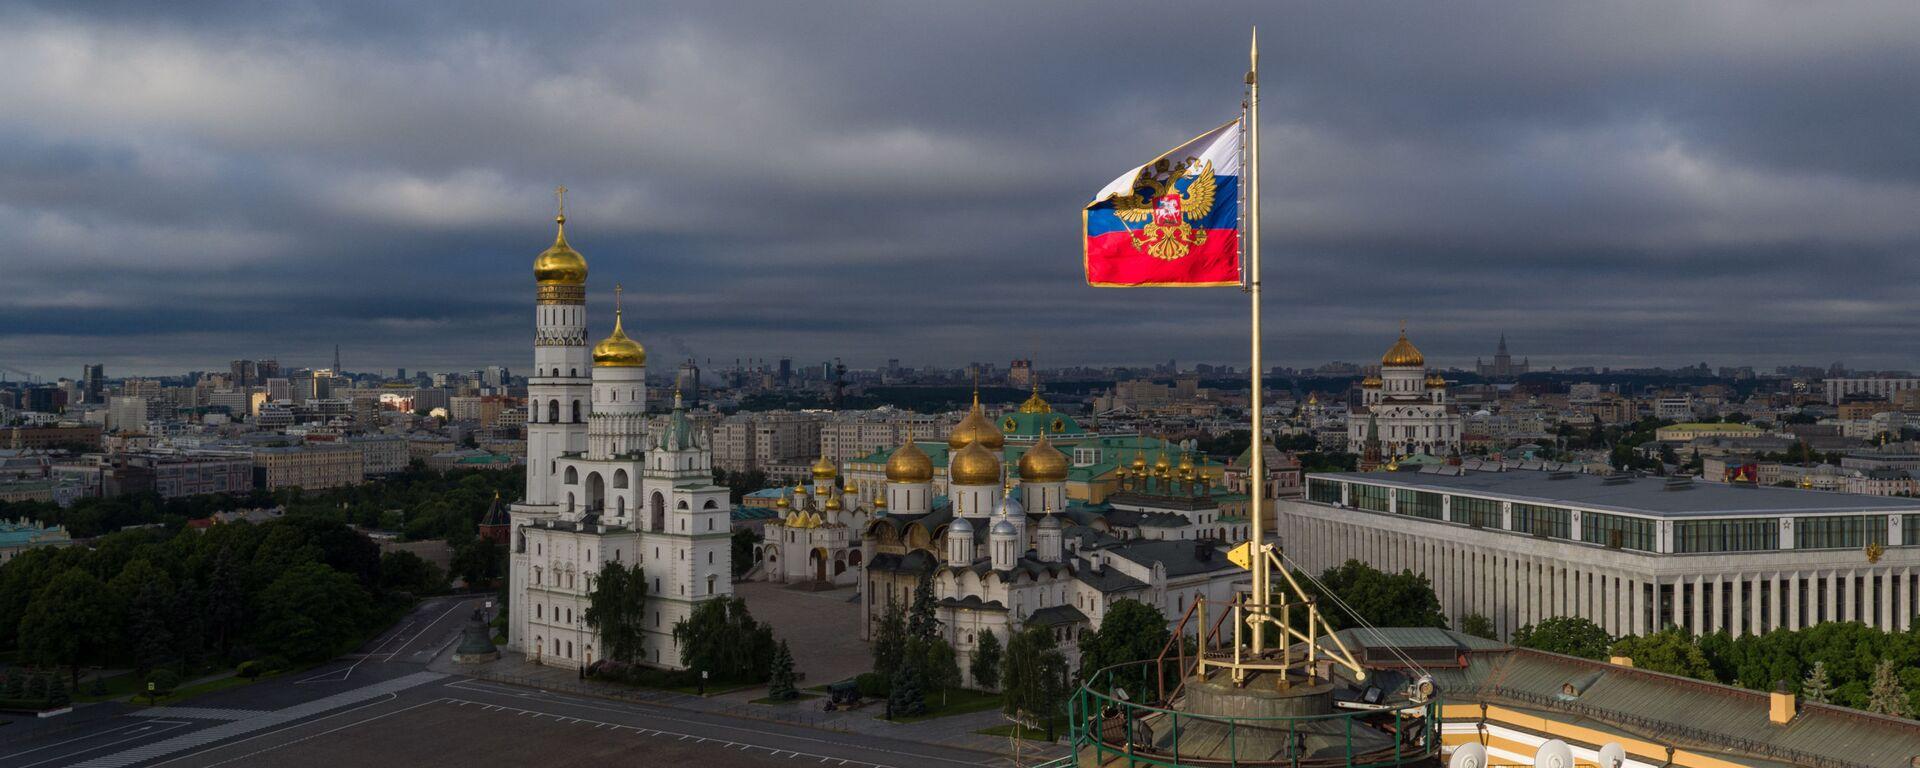 Kreml - Sputnik Polska, 1920, 05.02.2021